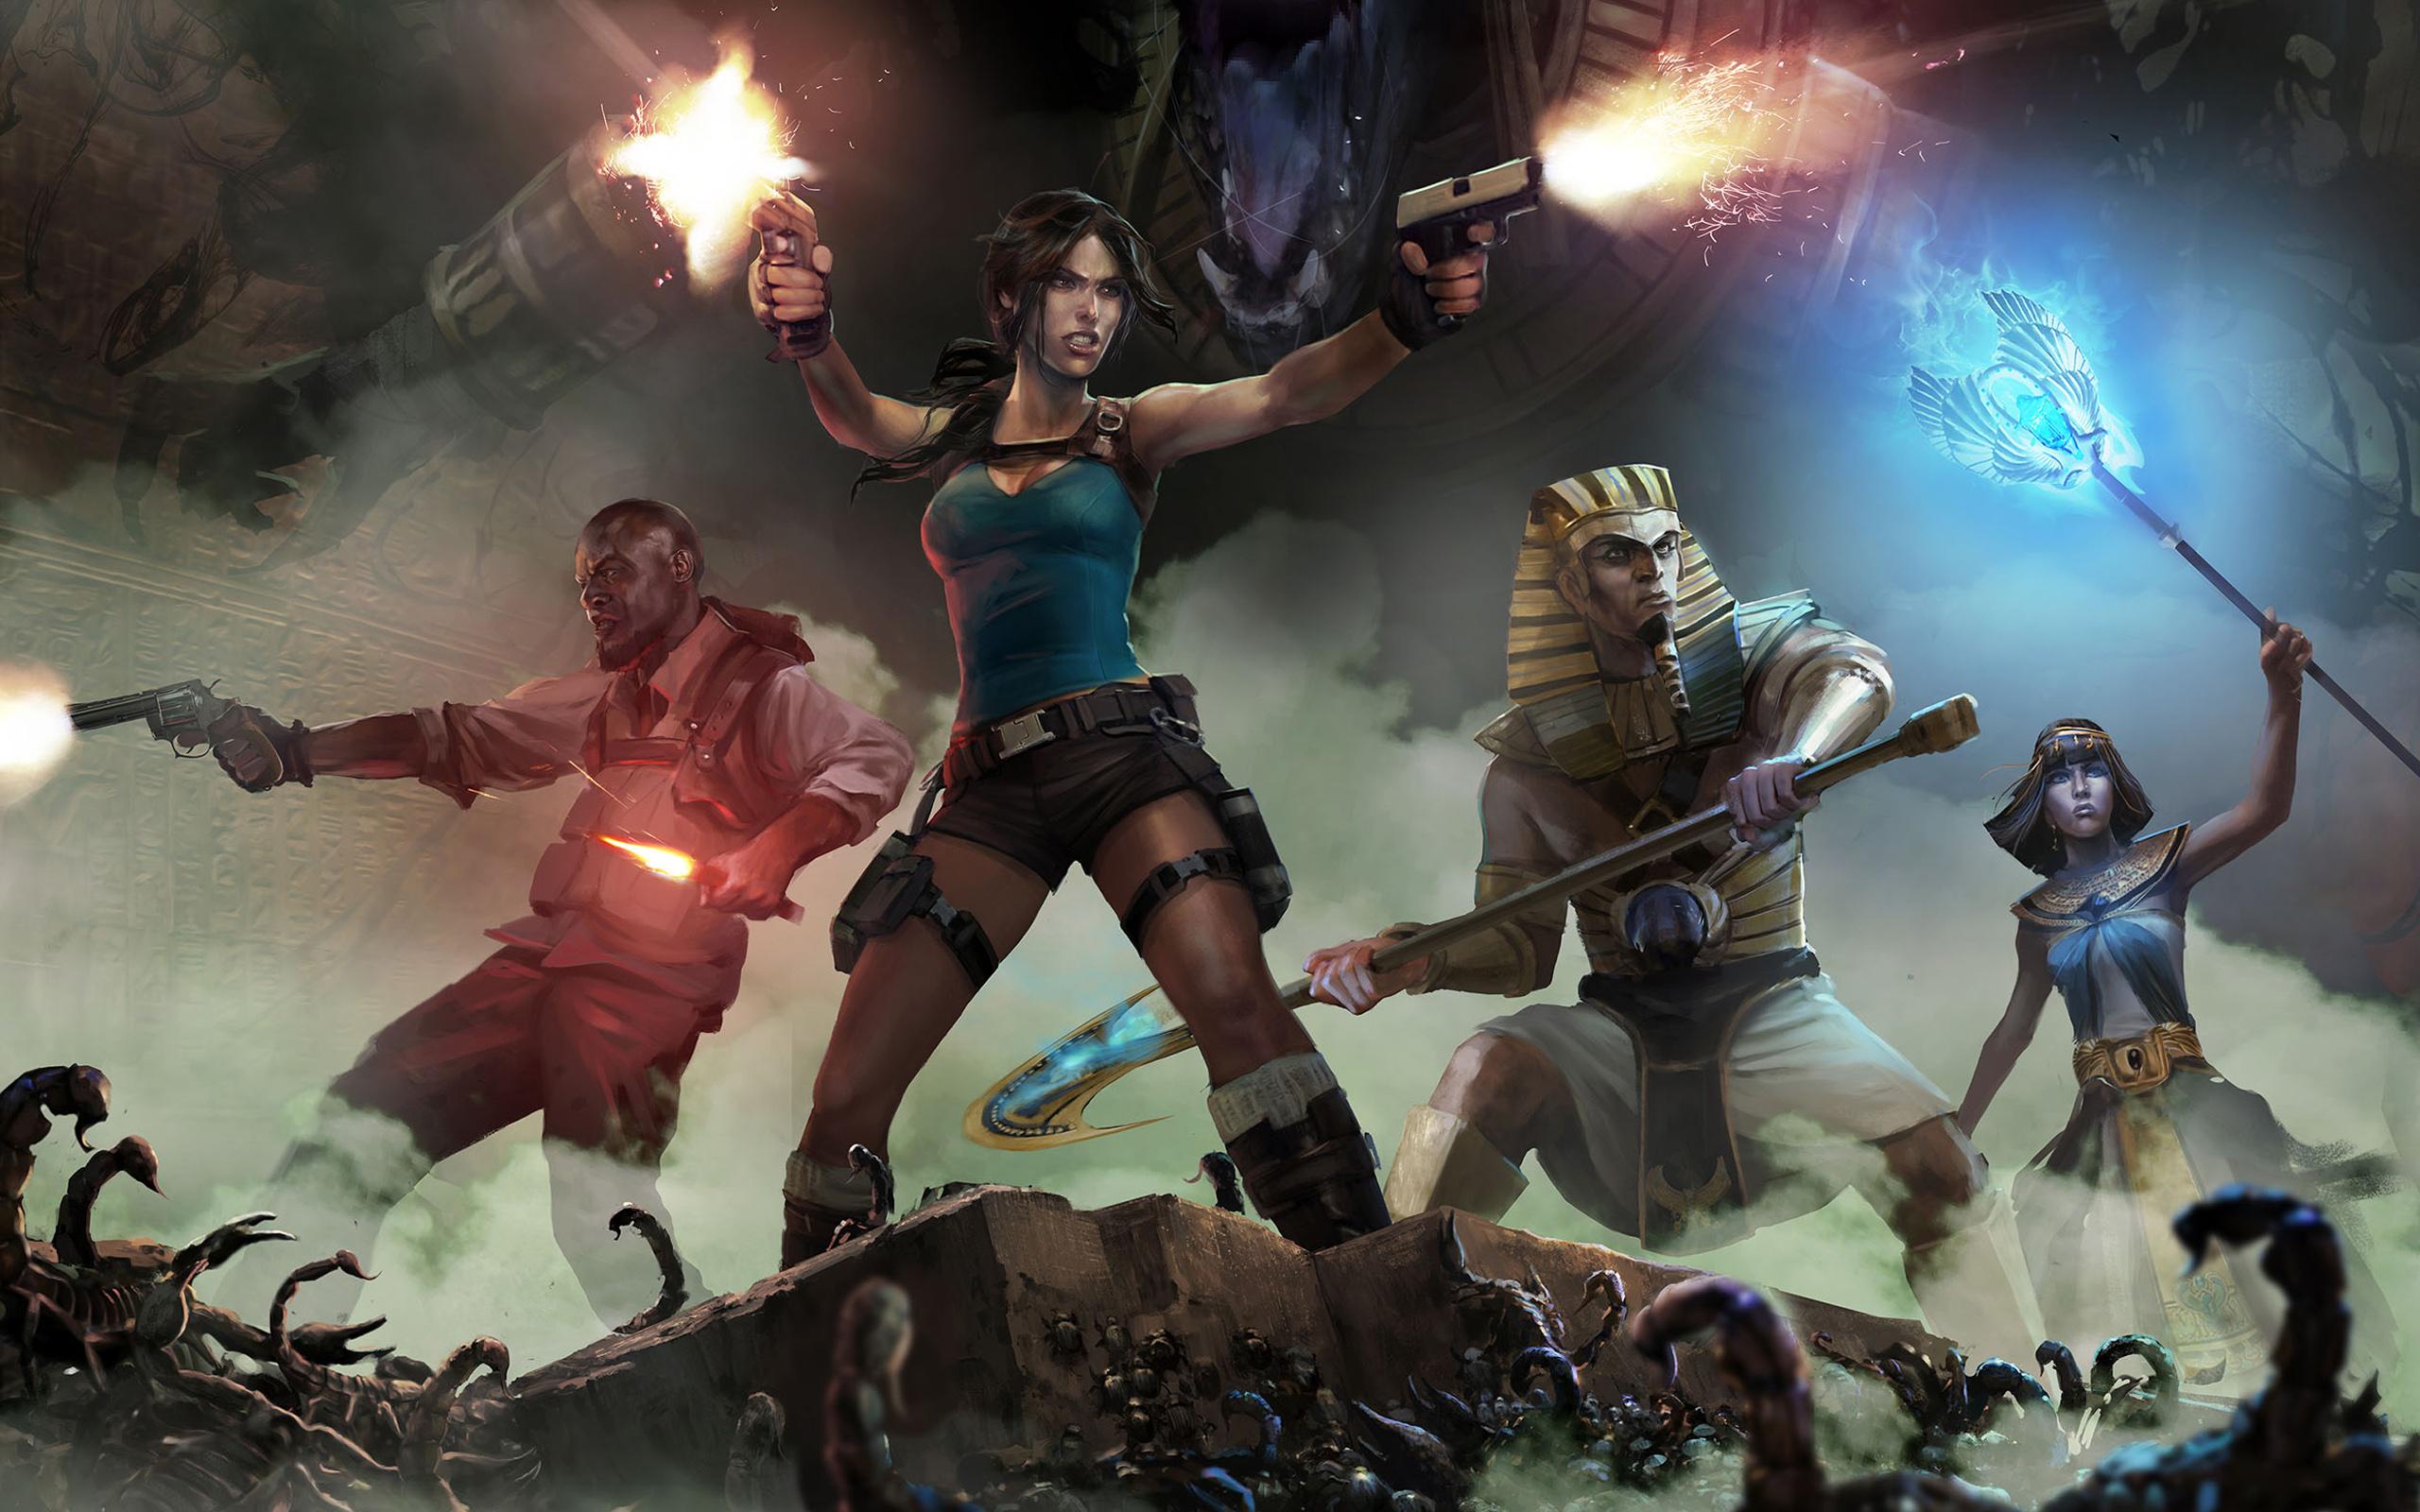 HD Wallpapers Lara Croft the Temple of Osiris